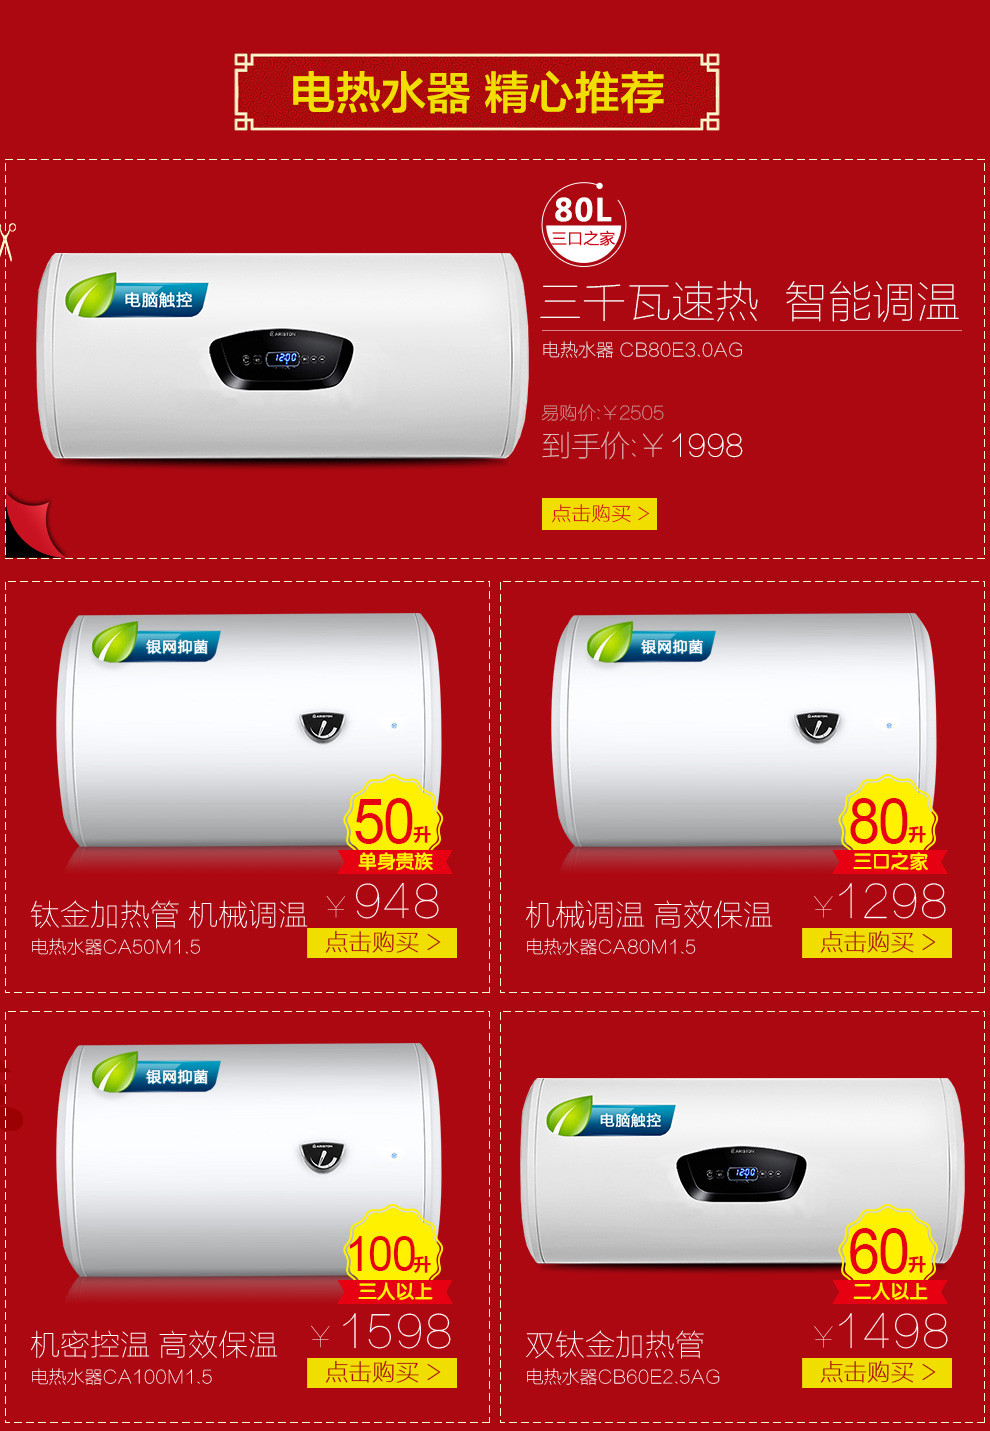 http://image.suning.cn/uimg/sop/commodity/201407221104165351_x.jpg_SLOKY施诺绮豌豆公主粉水晶项链毛衣链采用